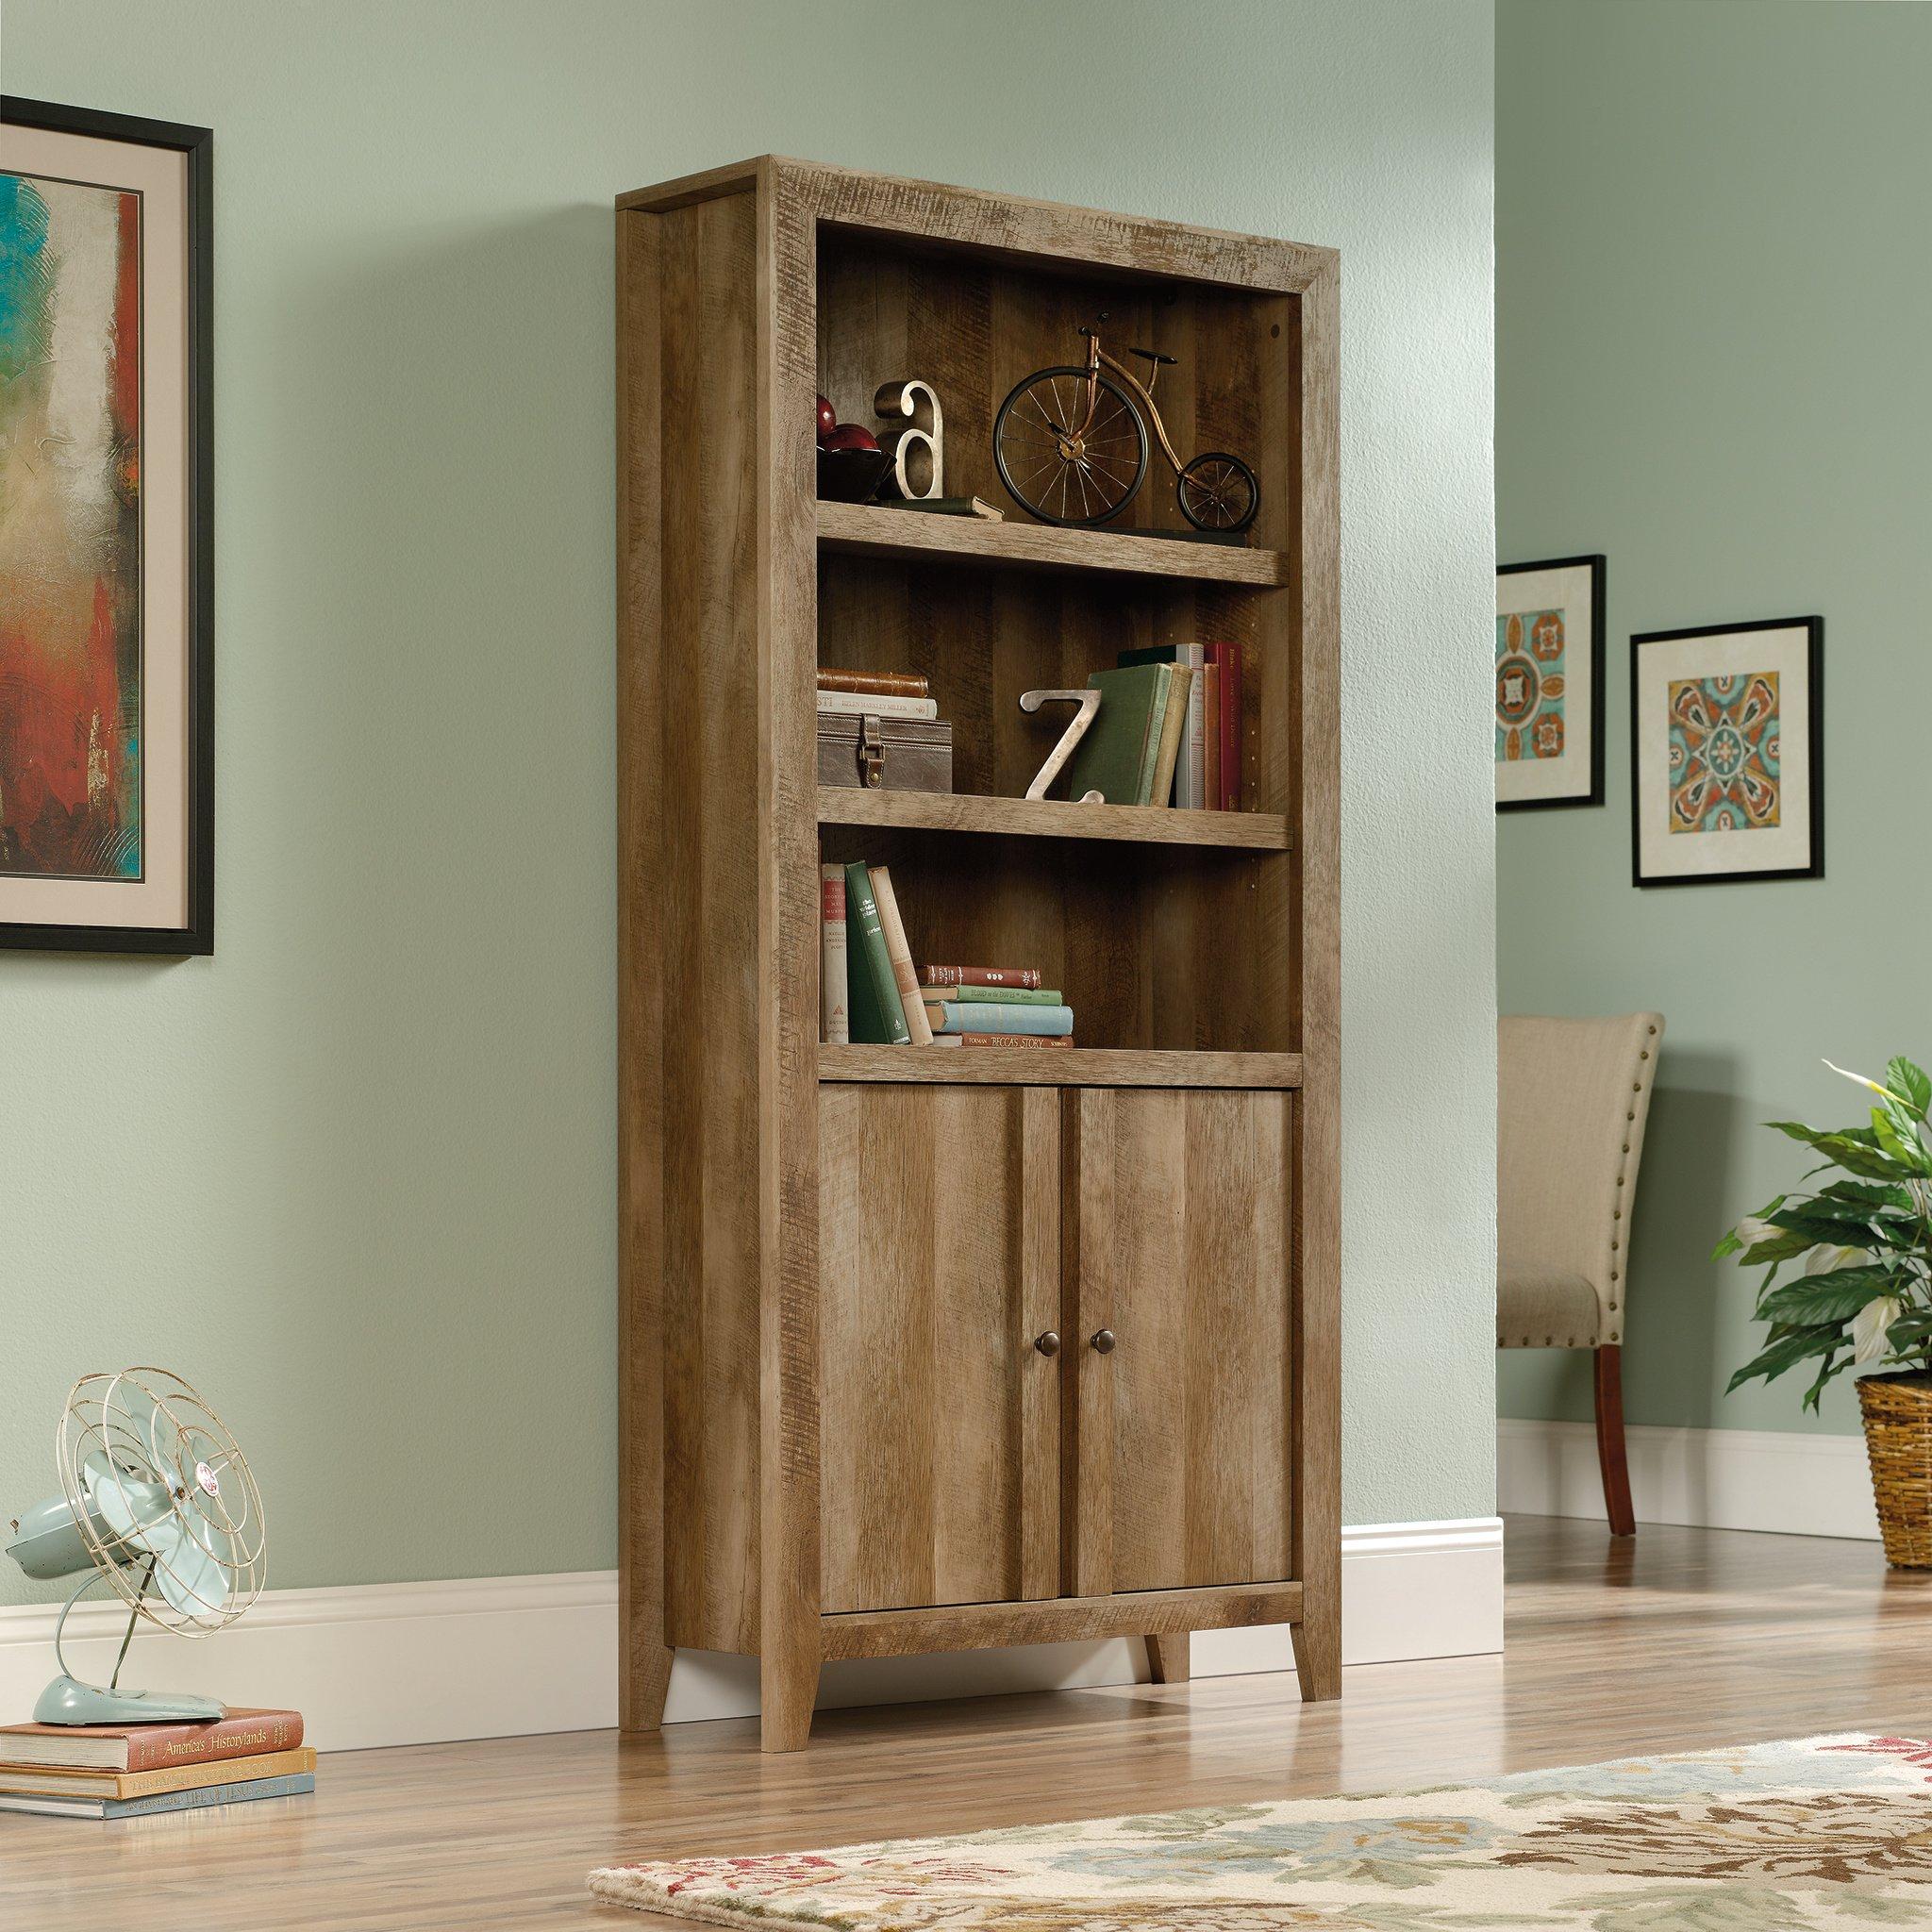 Sauder 420409 Dakota Pass Library with Doors, L: 33.82'' x W: 12.52'' x H: 71.10'', Craftsman Oak Finish by Sauder (Image #3)